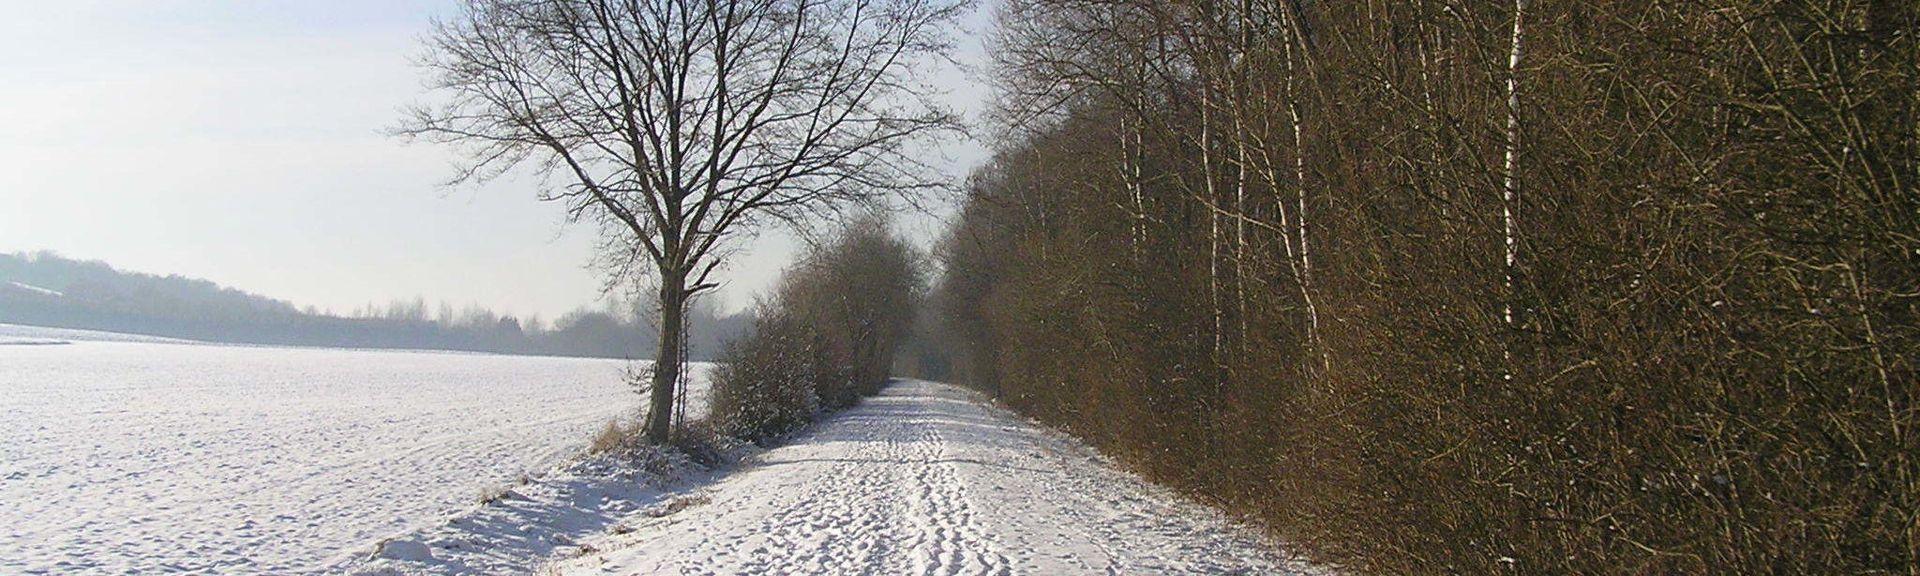 Ardennes, France